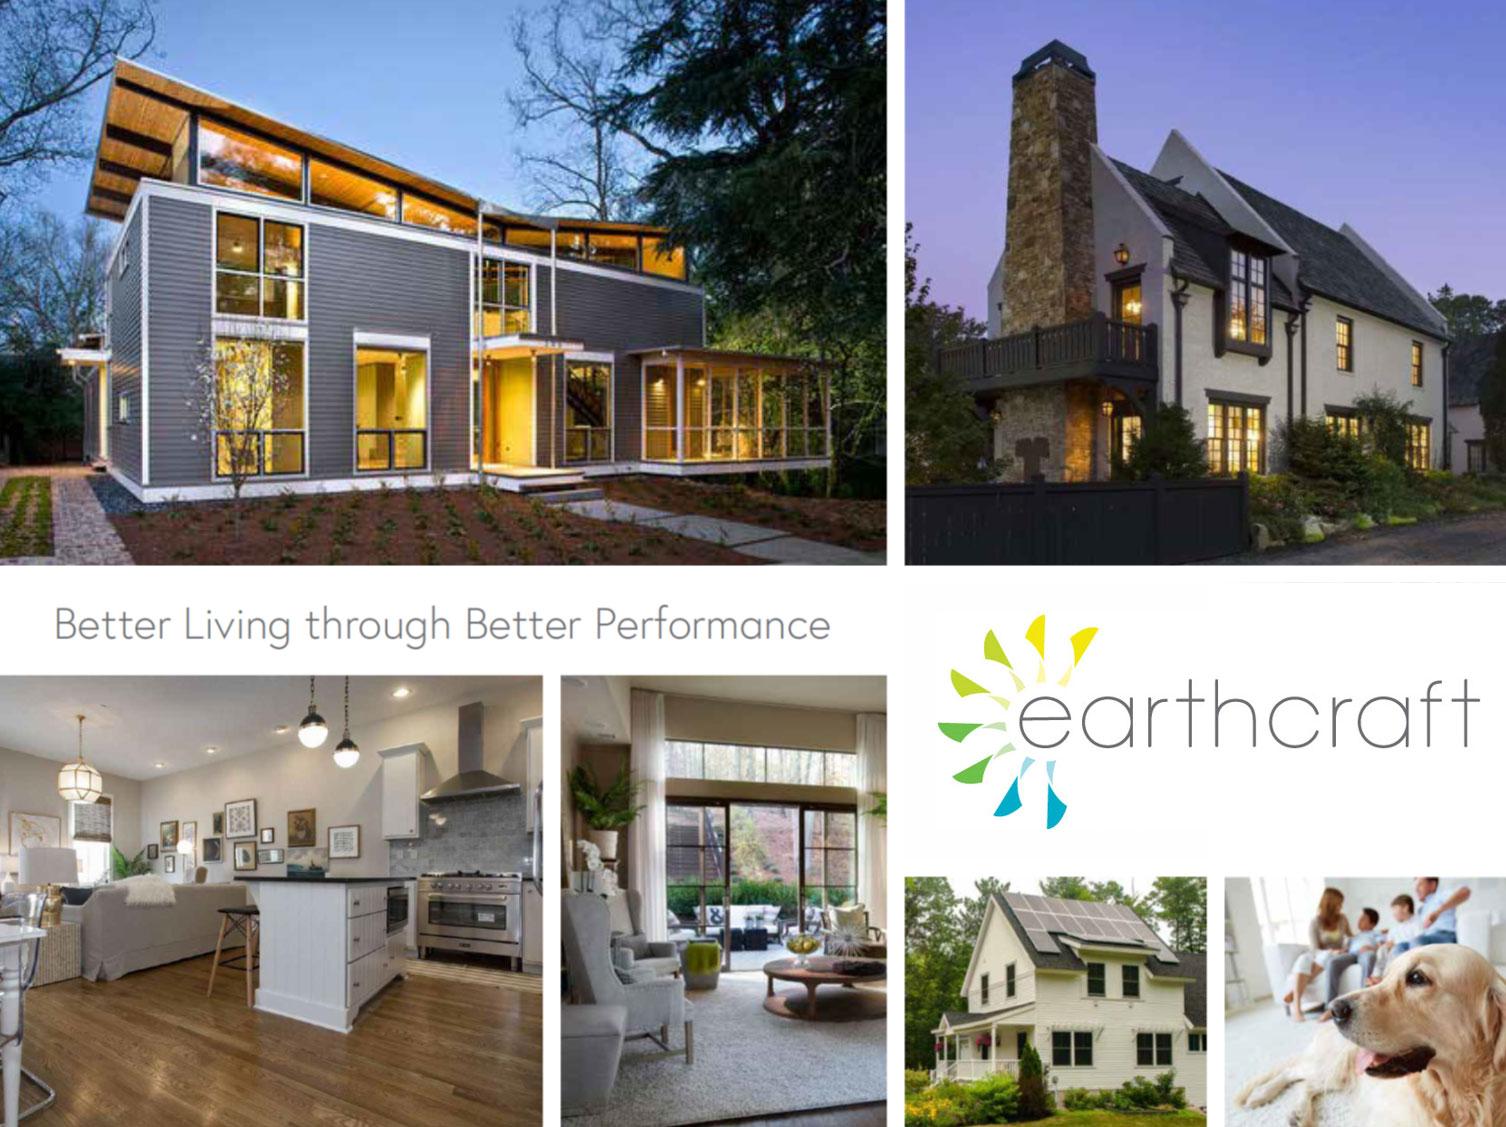 Earthcraft Branding Usage Concept | Designed by Clementine Creative Agency | Marietta, GA